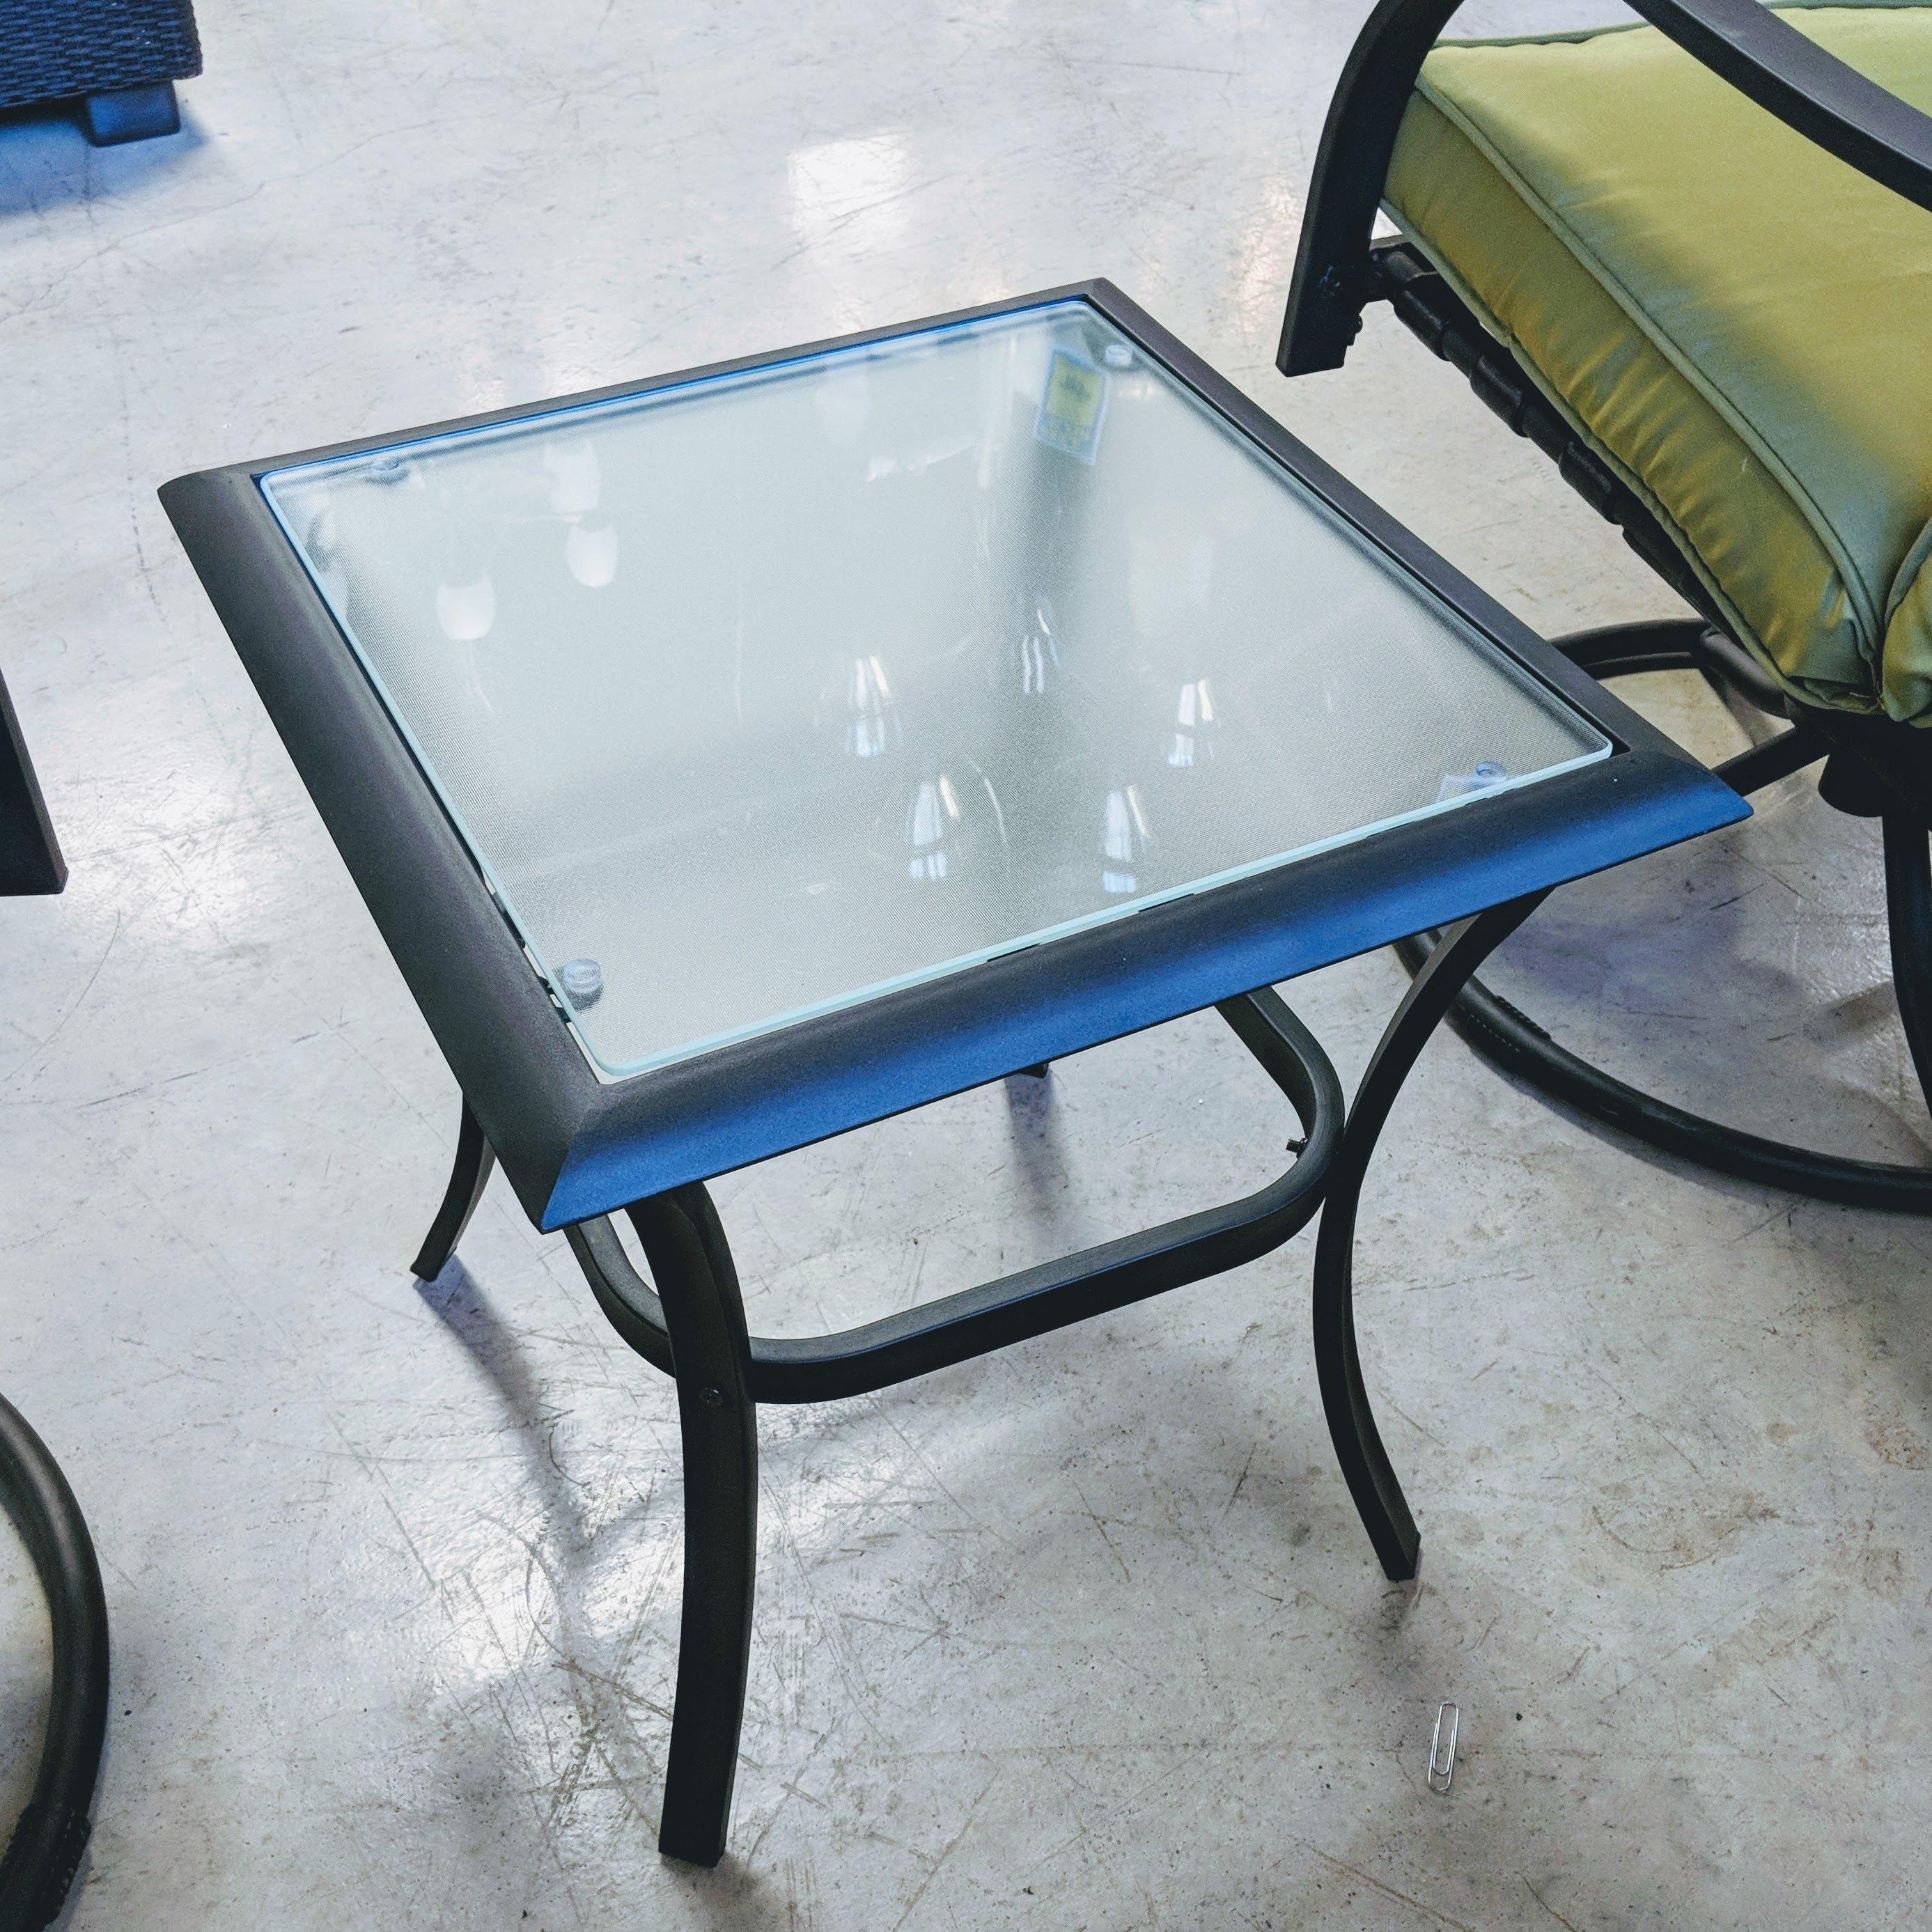 Deep Seat 3 Piece Rock Chair Set with Cushion